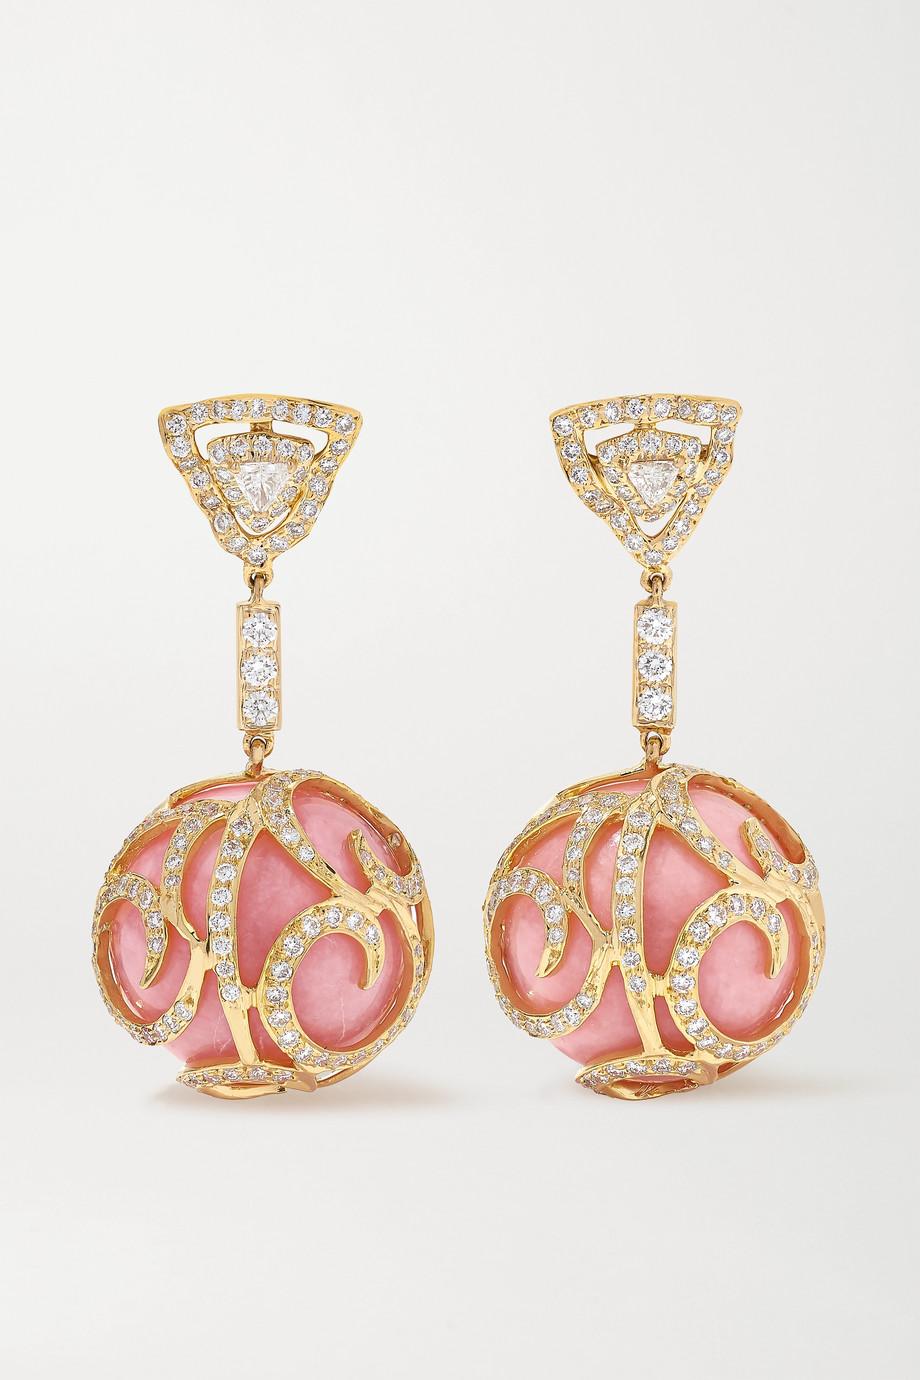 Bina Goenka 18-karat gold, opal and diamond earrings